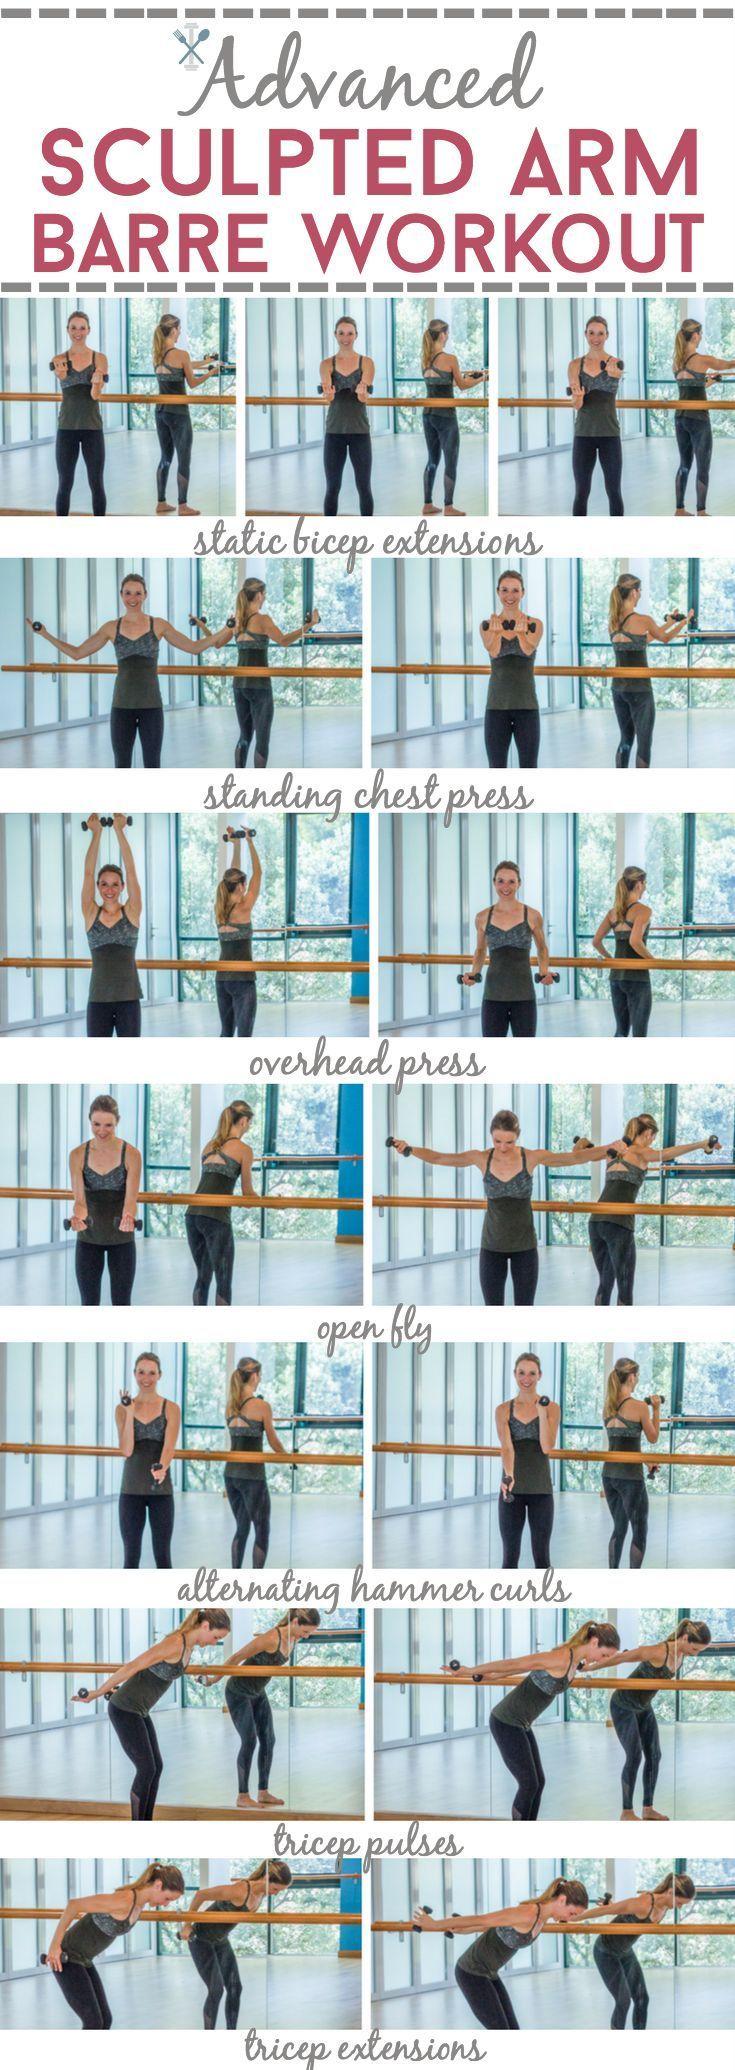 Advanced Sculpted Arm Barre Workout